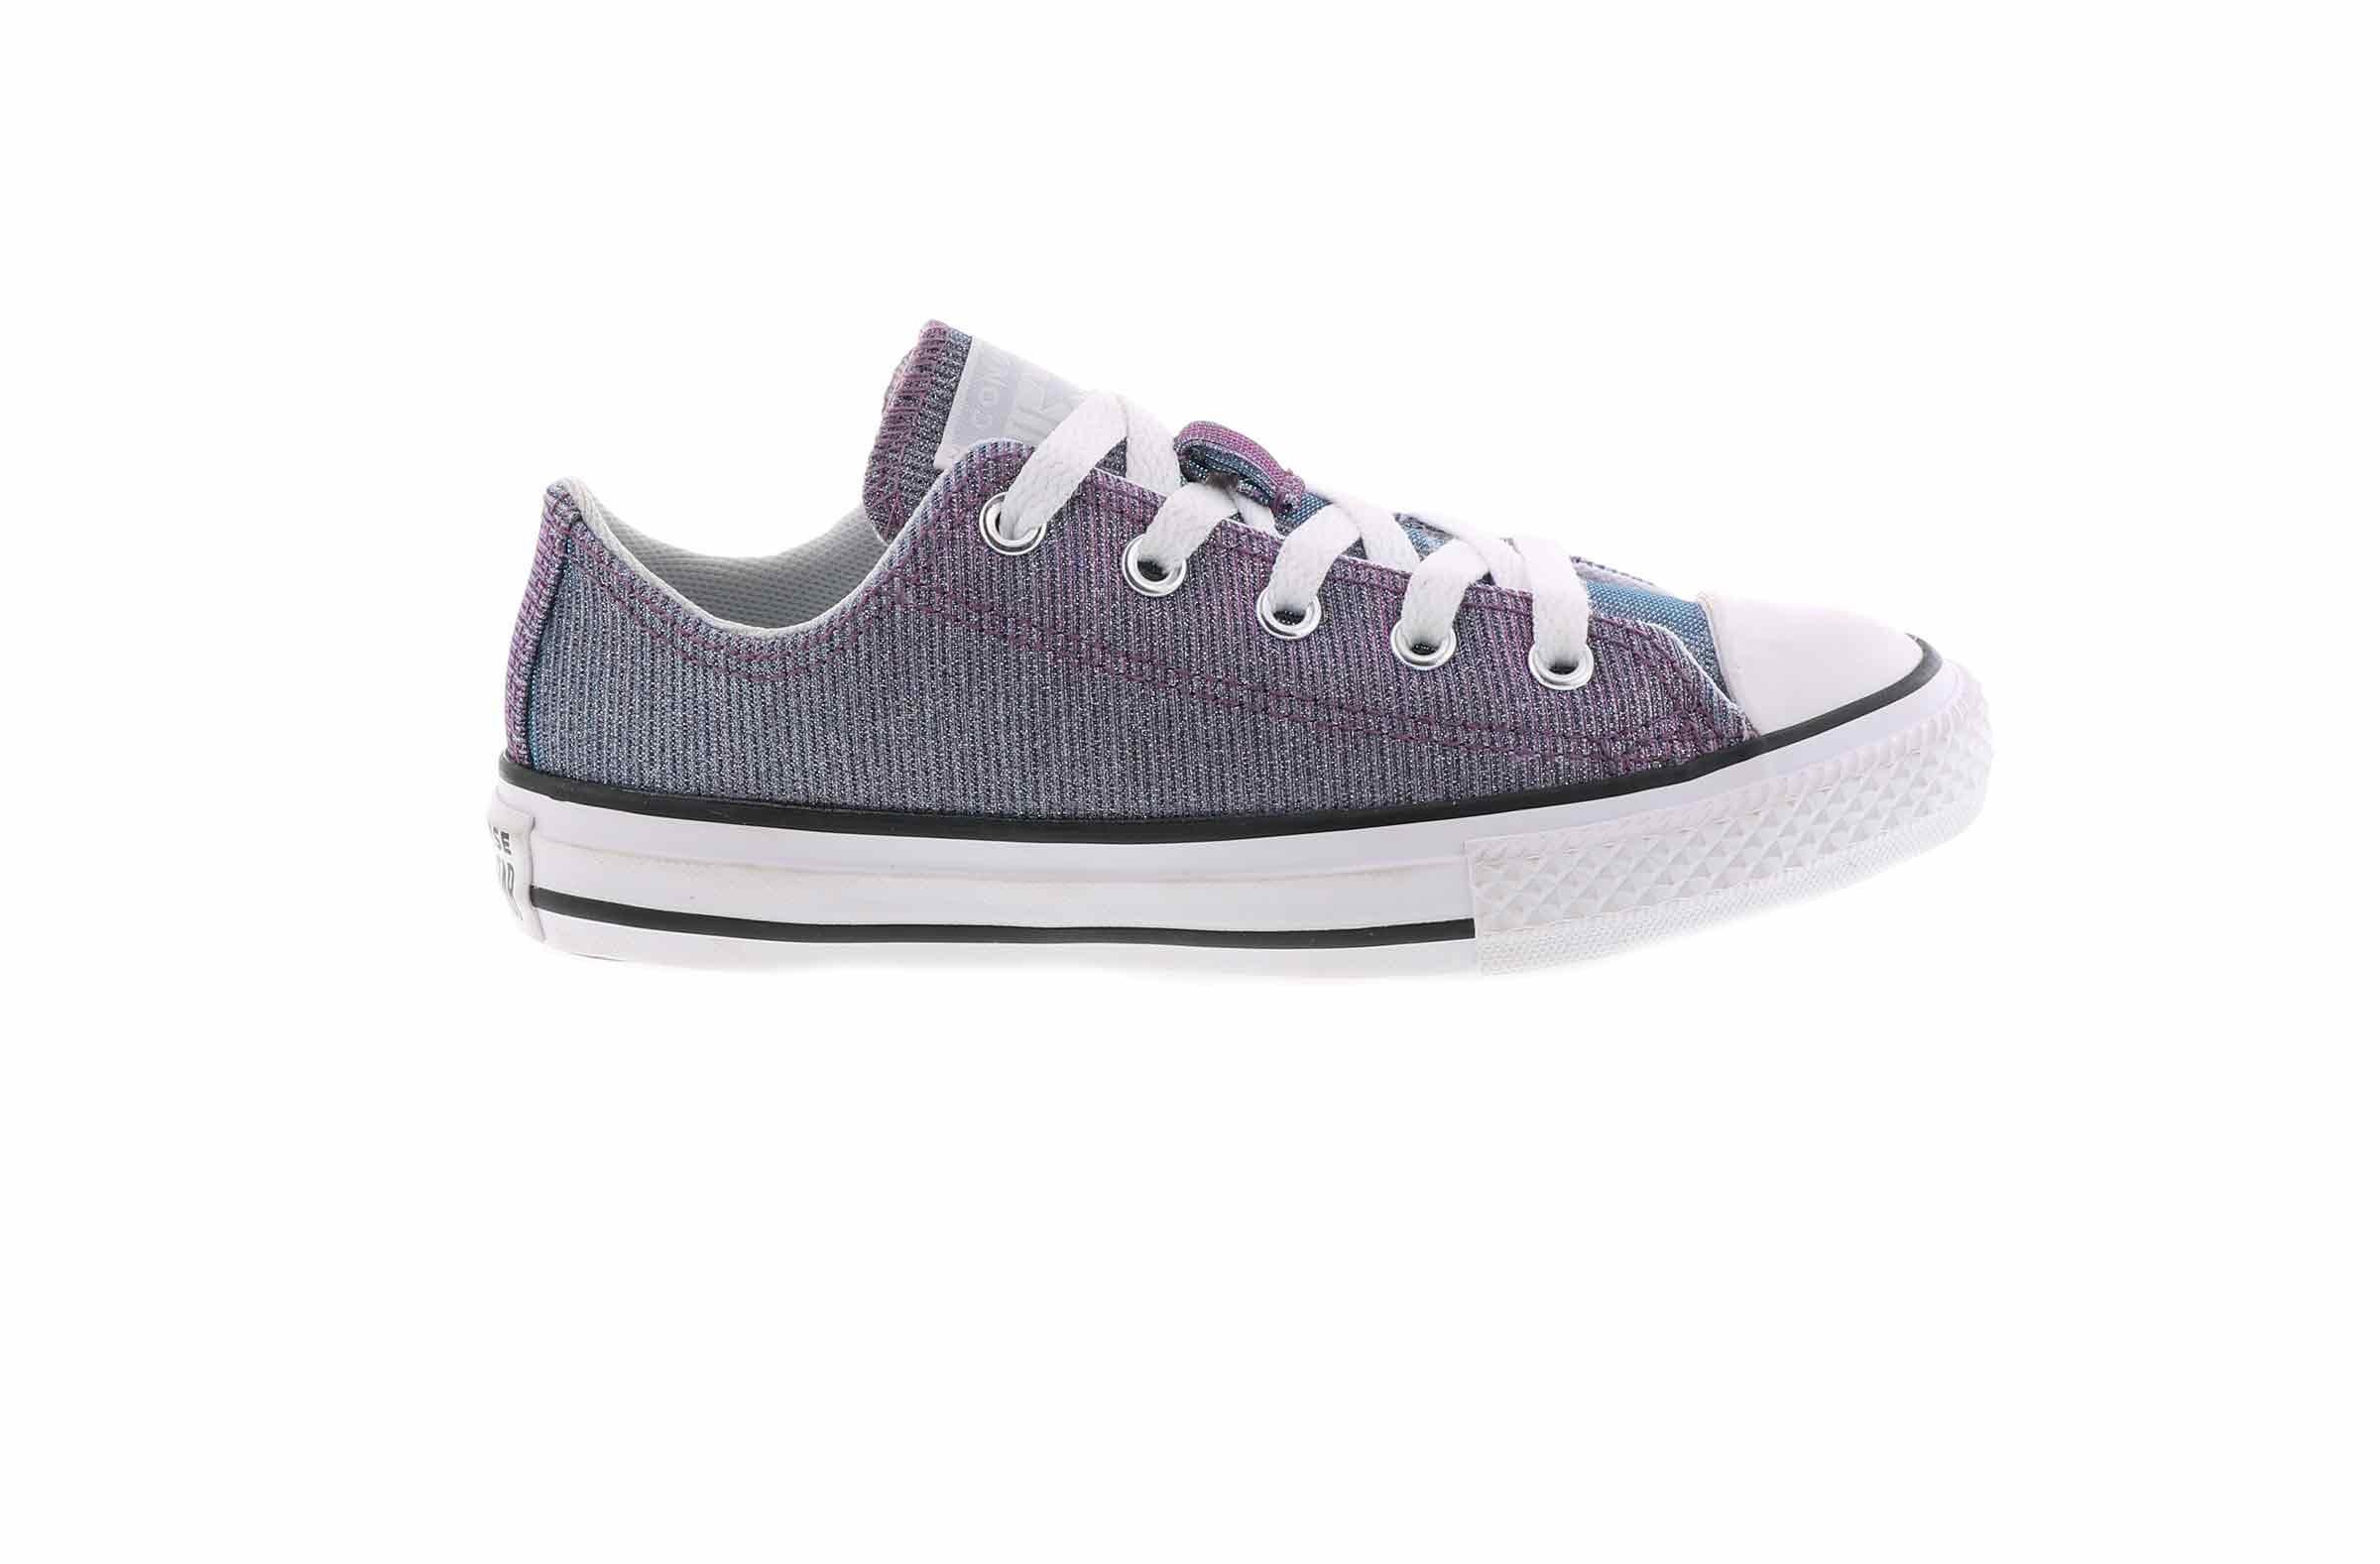 Women's Converse Chuck Taylor All Star Ox Metallic Shoes [KE3007LA] Silver